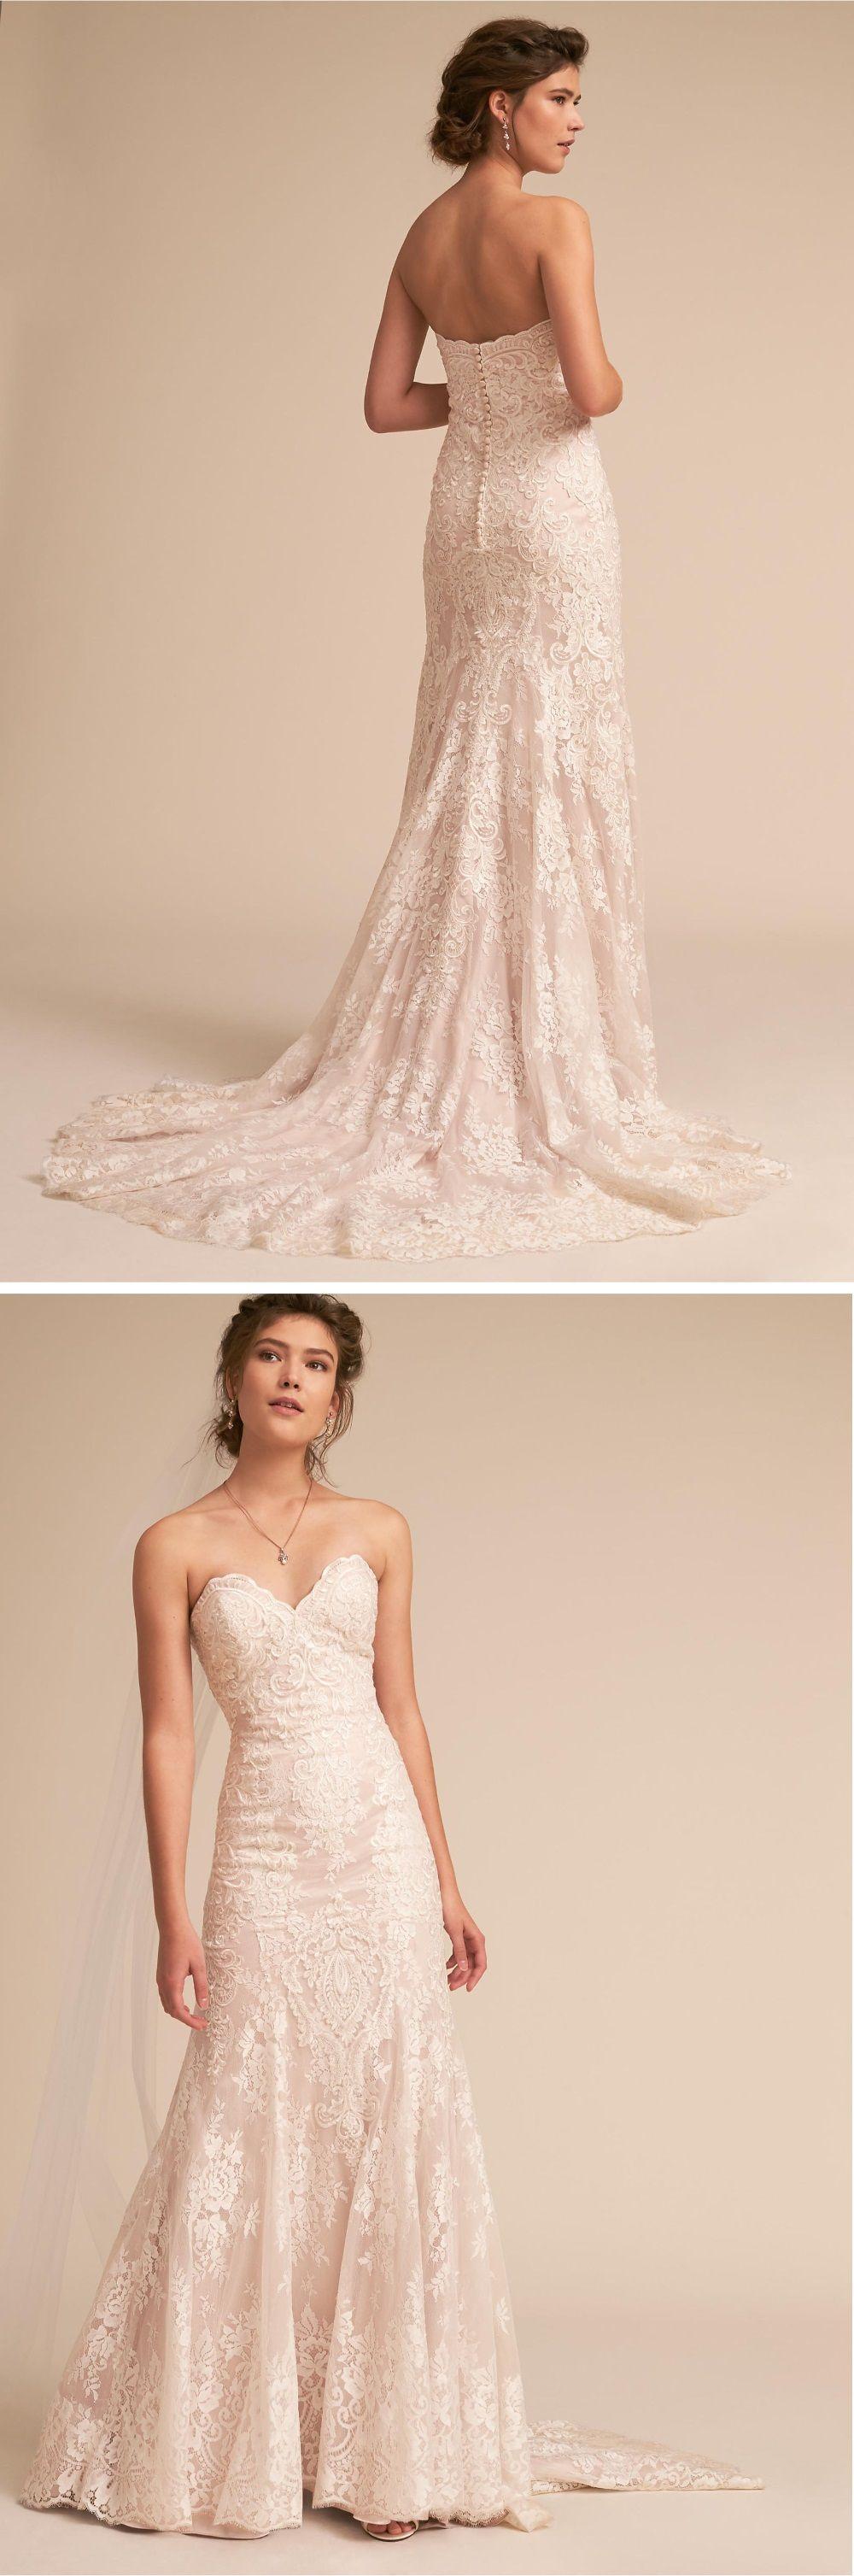 Chantilly lace wedding dress wedding dress train weddingdress